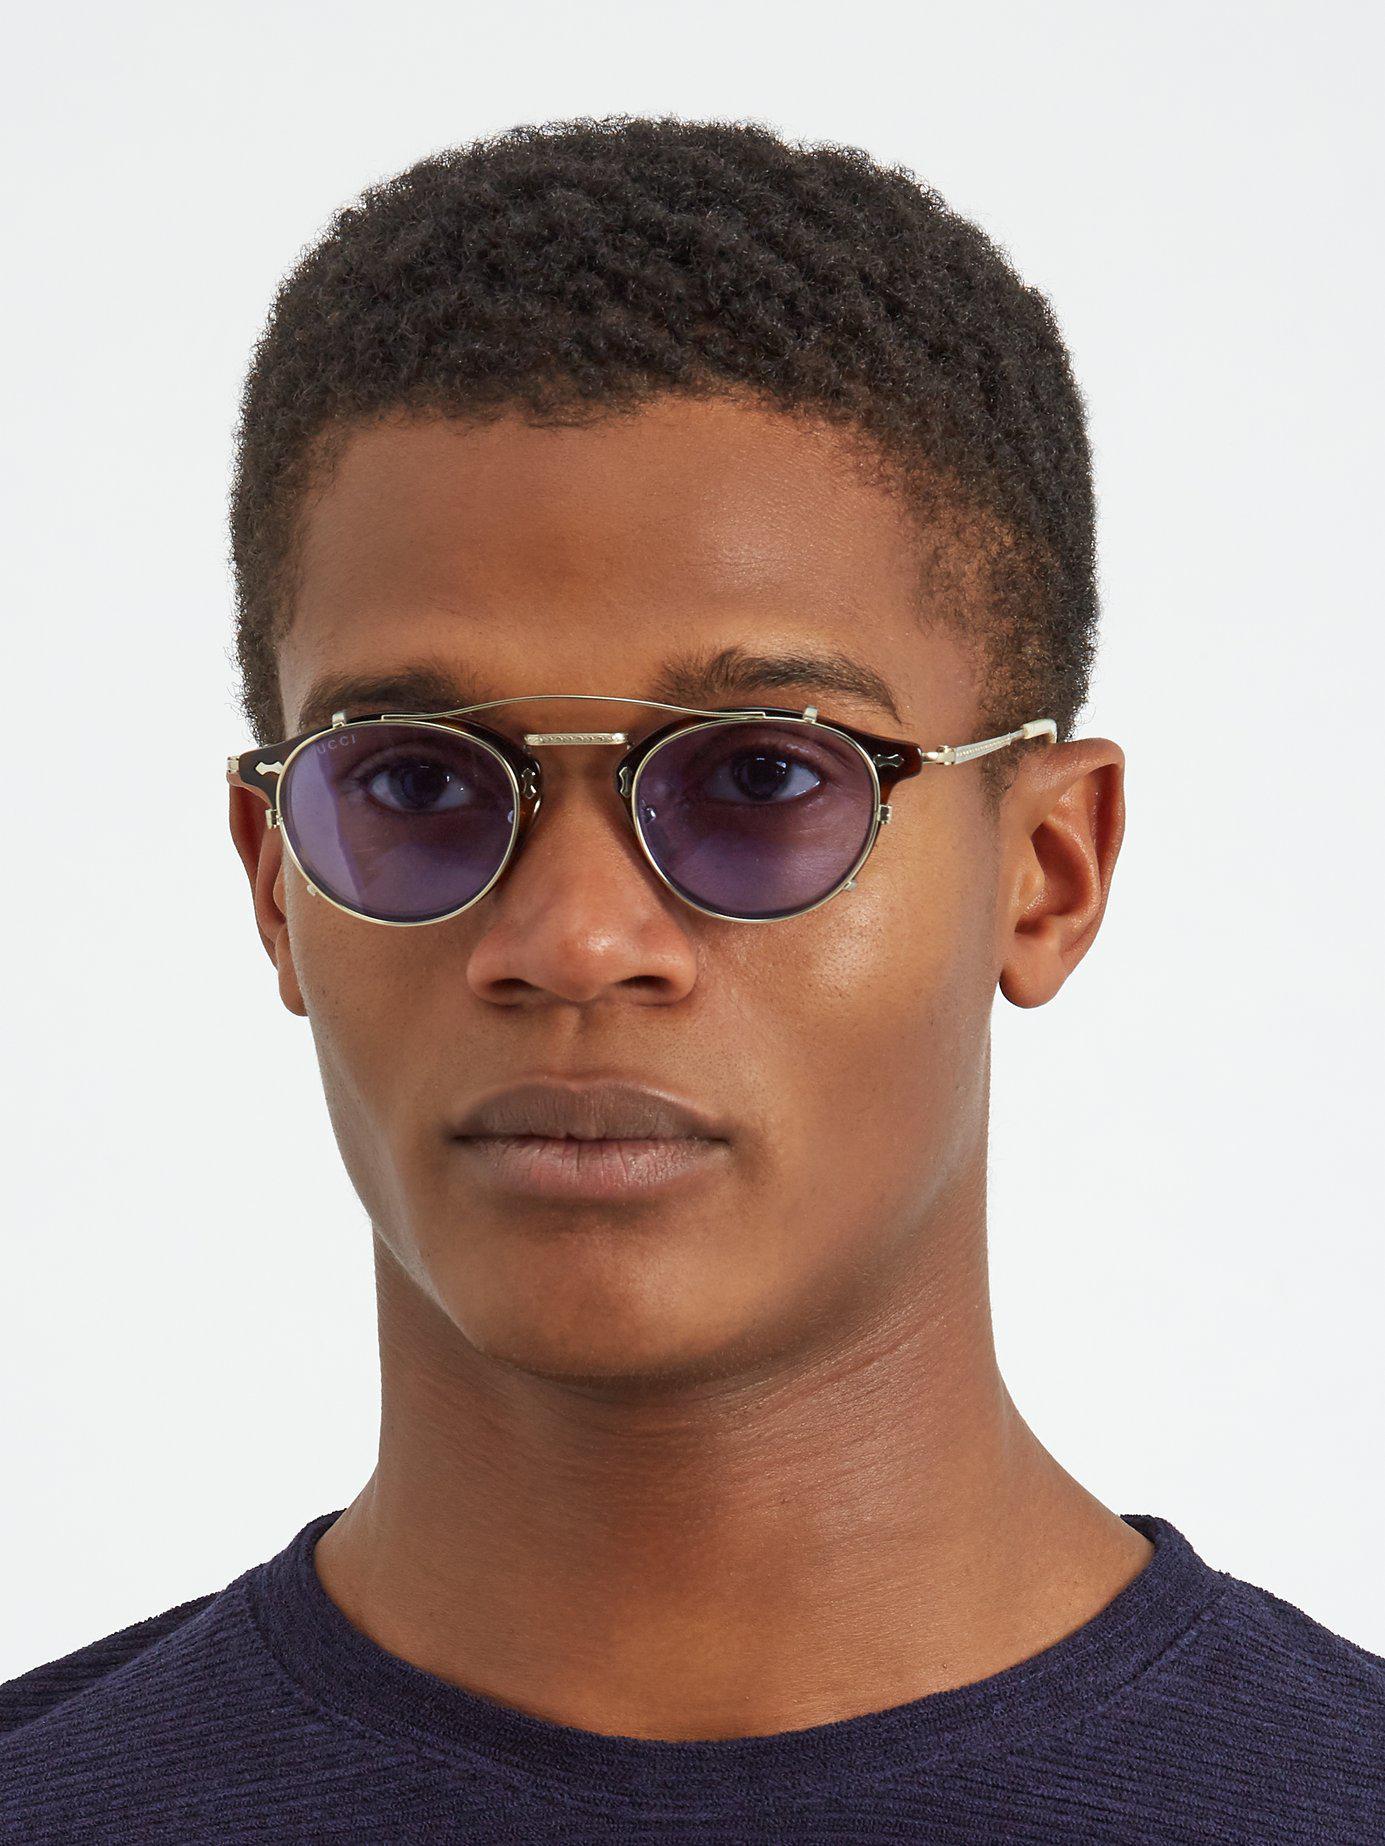 fcca3826cda Gucci - Brown Detachable Lens Round Frame Acetate Sunglasses for Men -  Lyst. View fullscreen